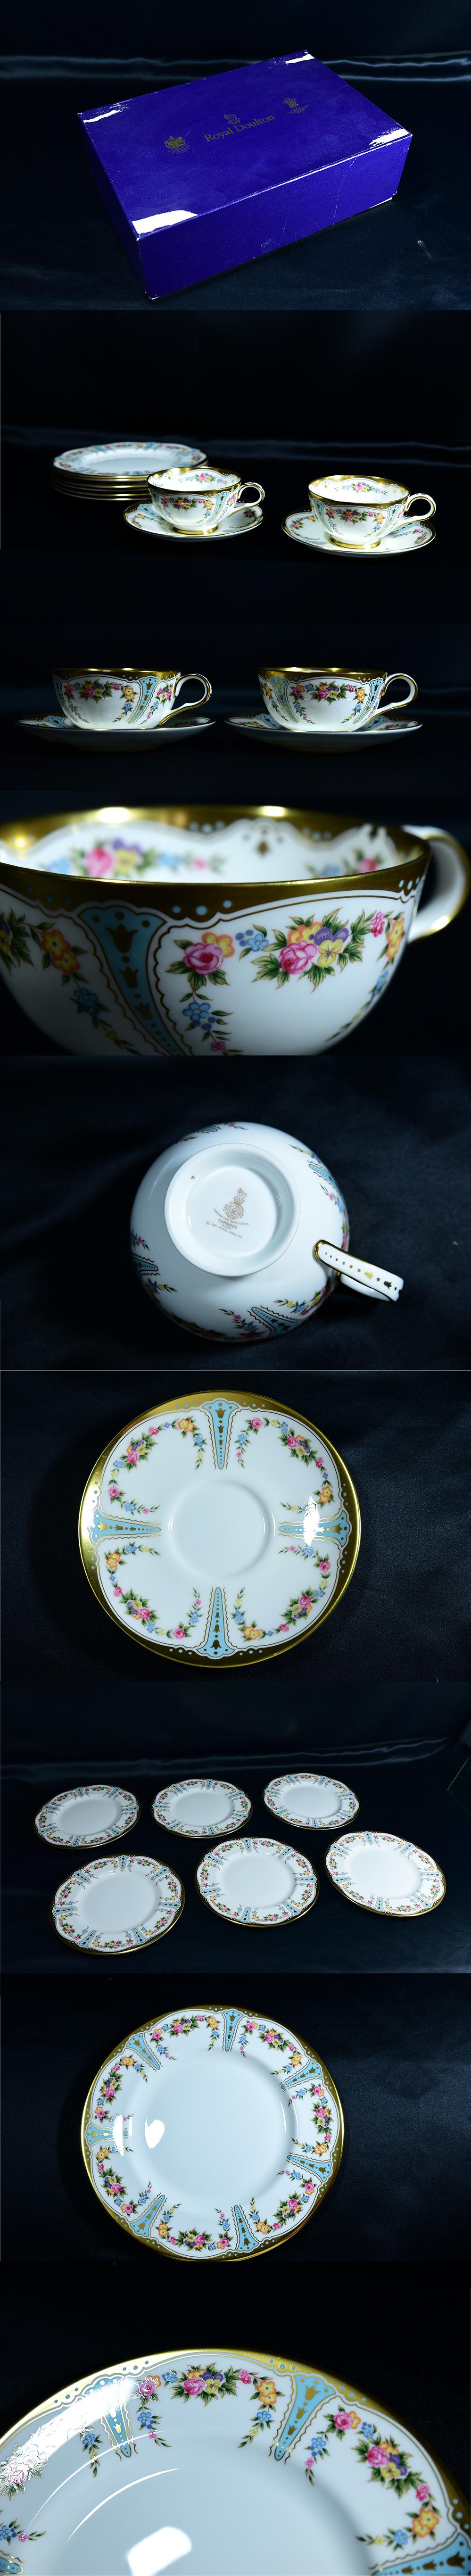 Royal Doulton カーノック 食器セット